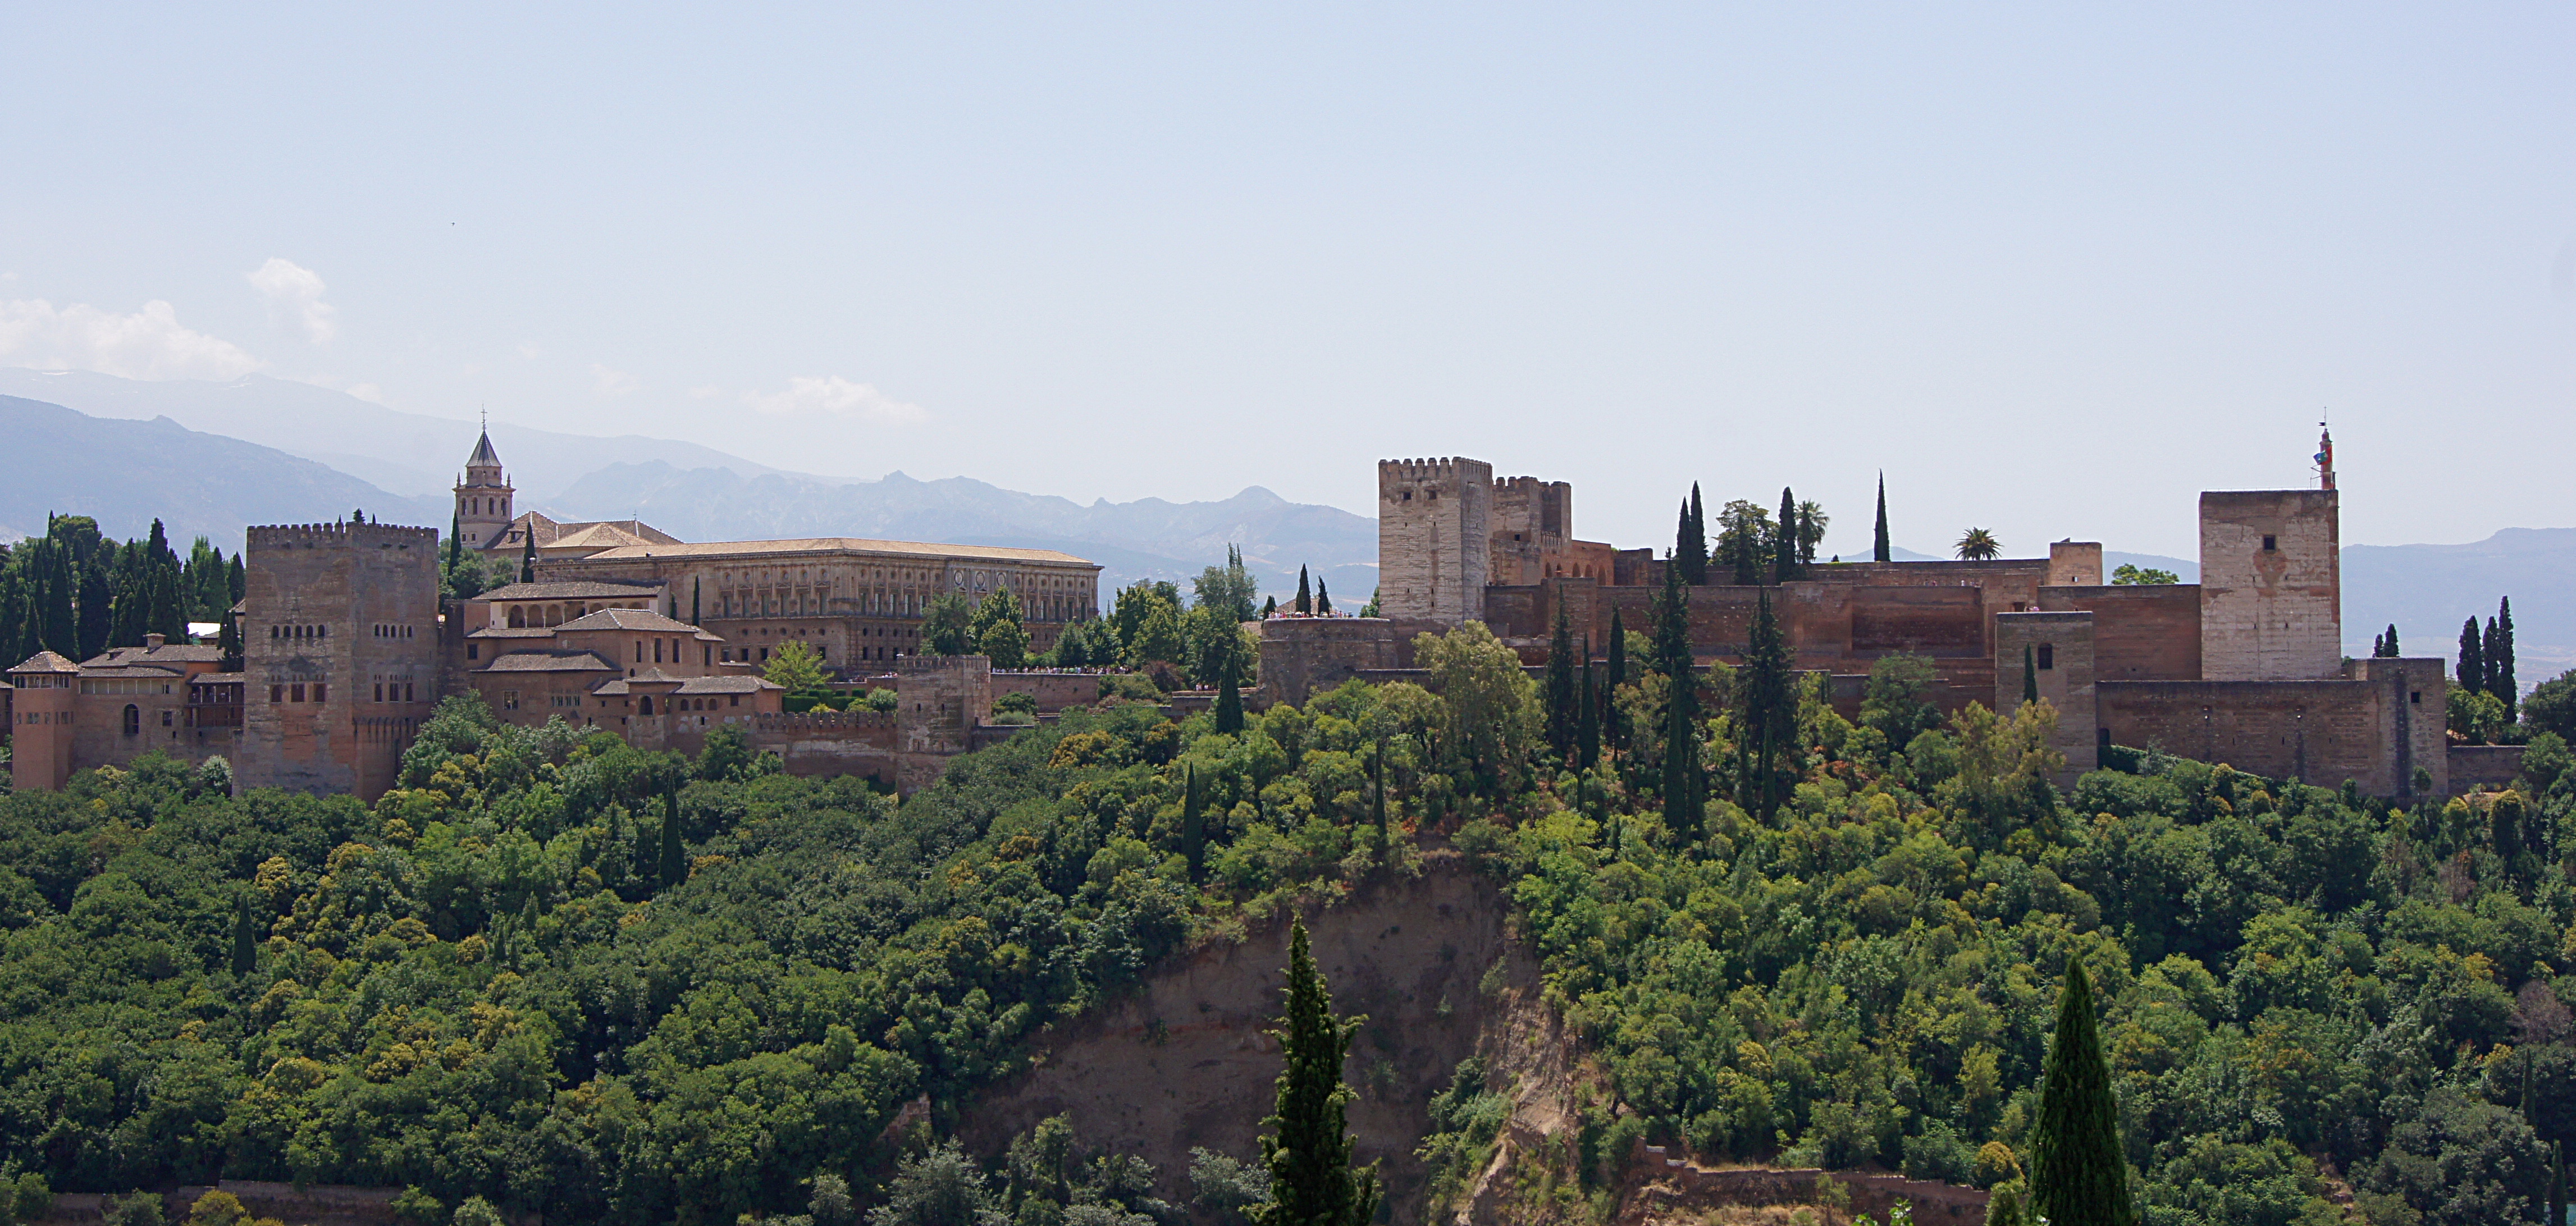 Fichier:Alhambra Granada Mirador san Nicolas.jpg — Wikipédia